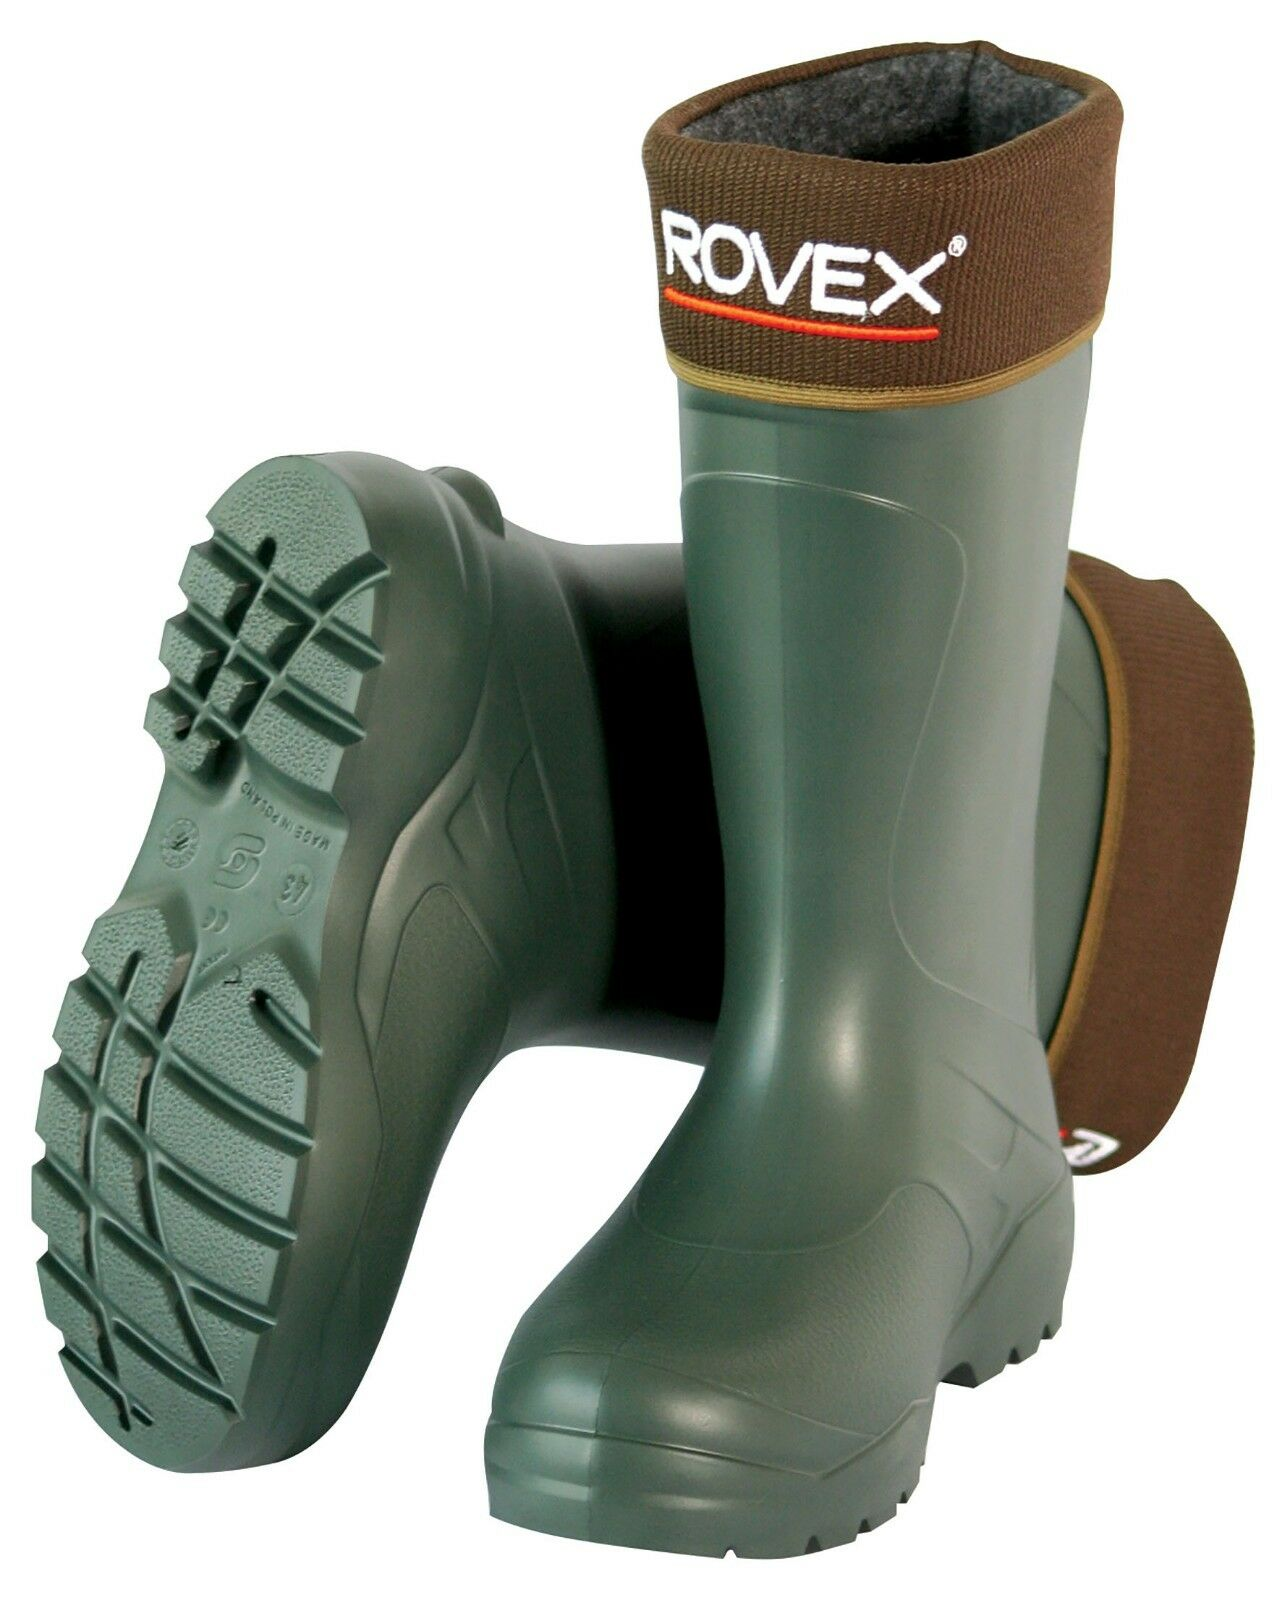 Rovex Arctic Thermal Boots - Fishing Boots - Carp Fishing - Sea Fishing Boots